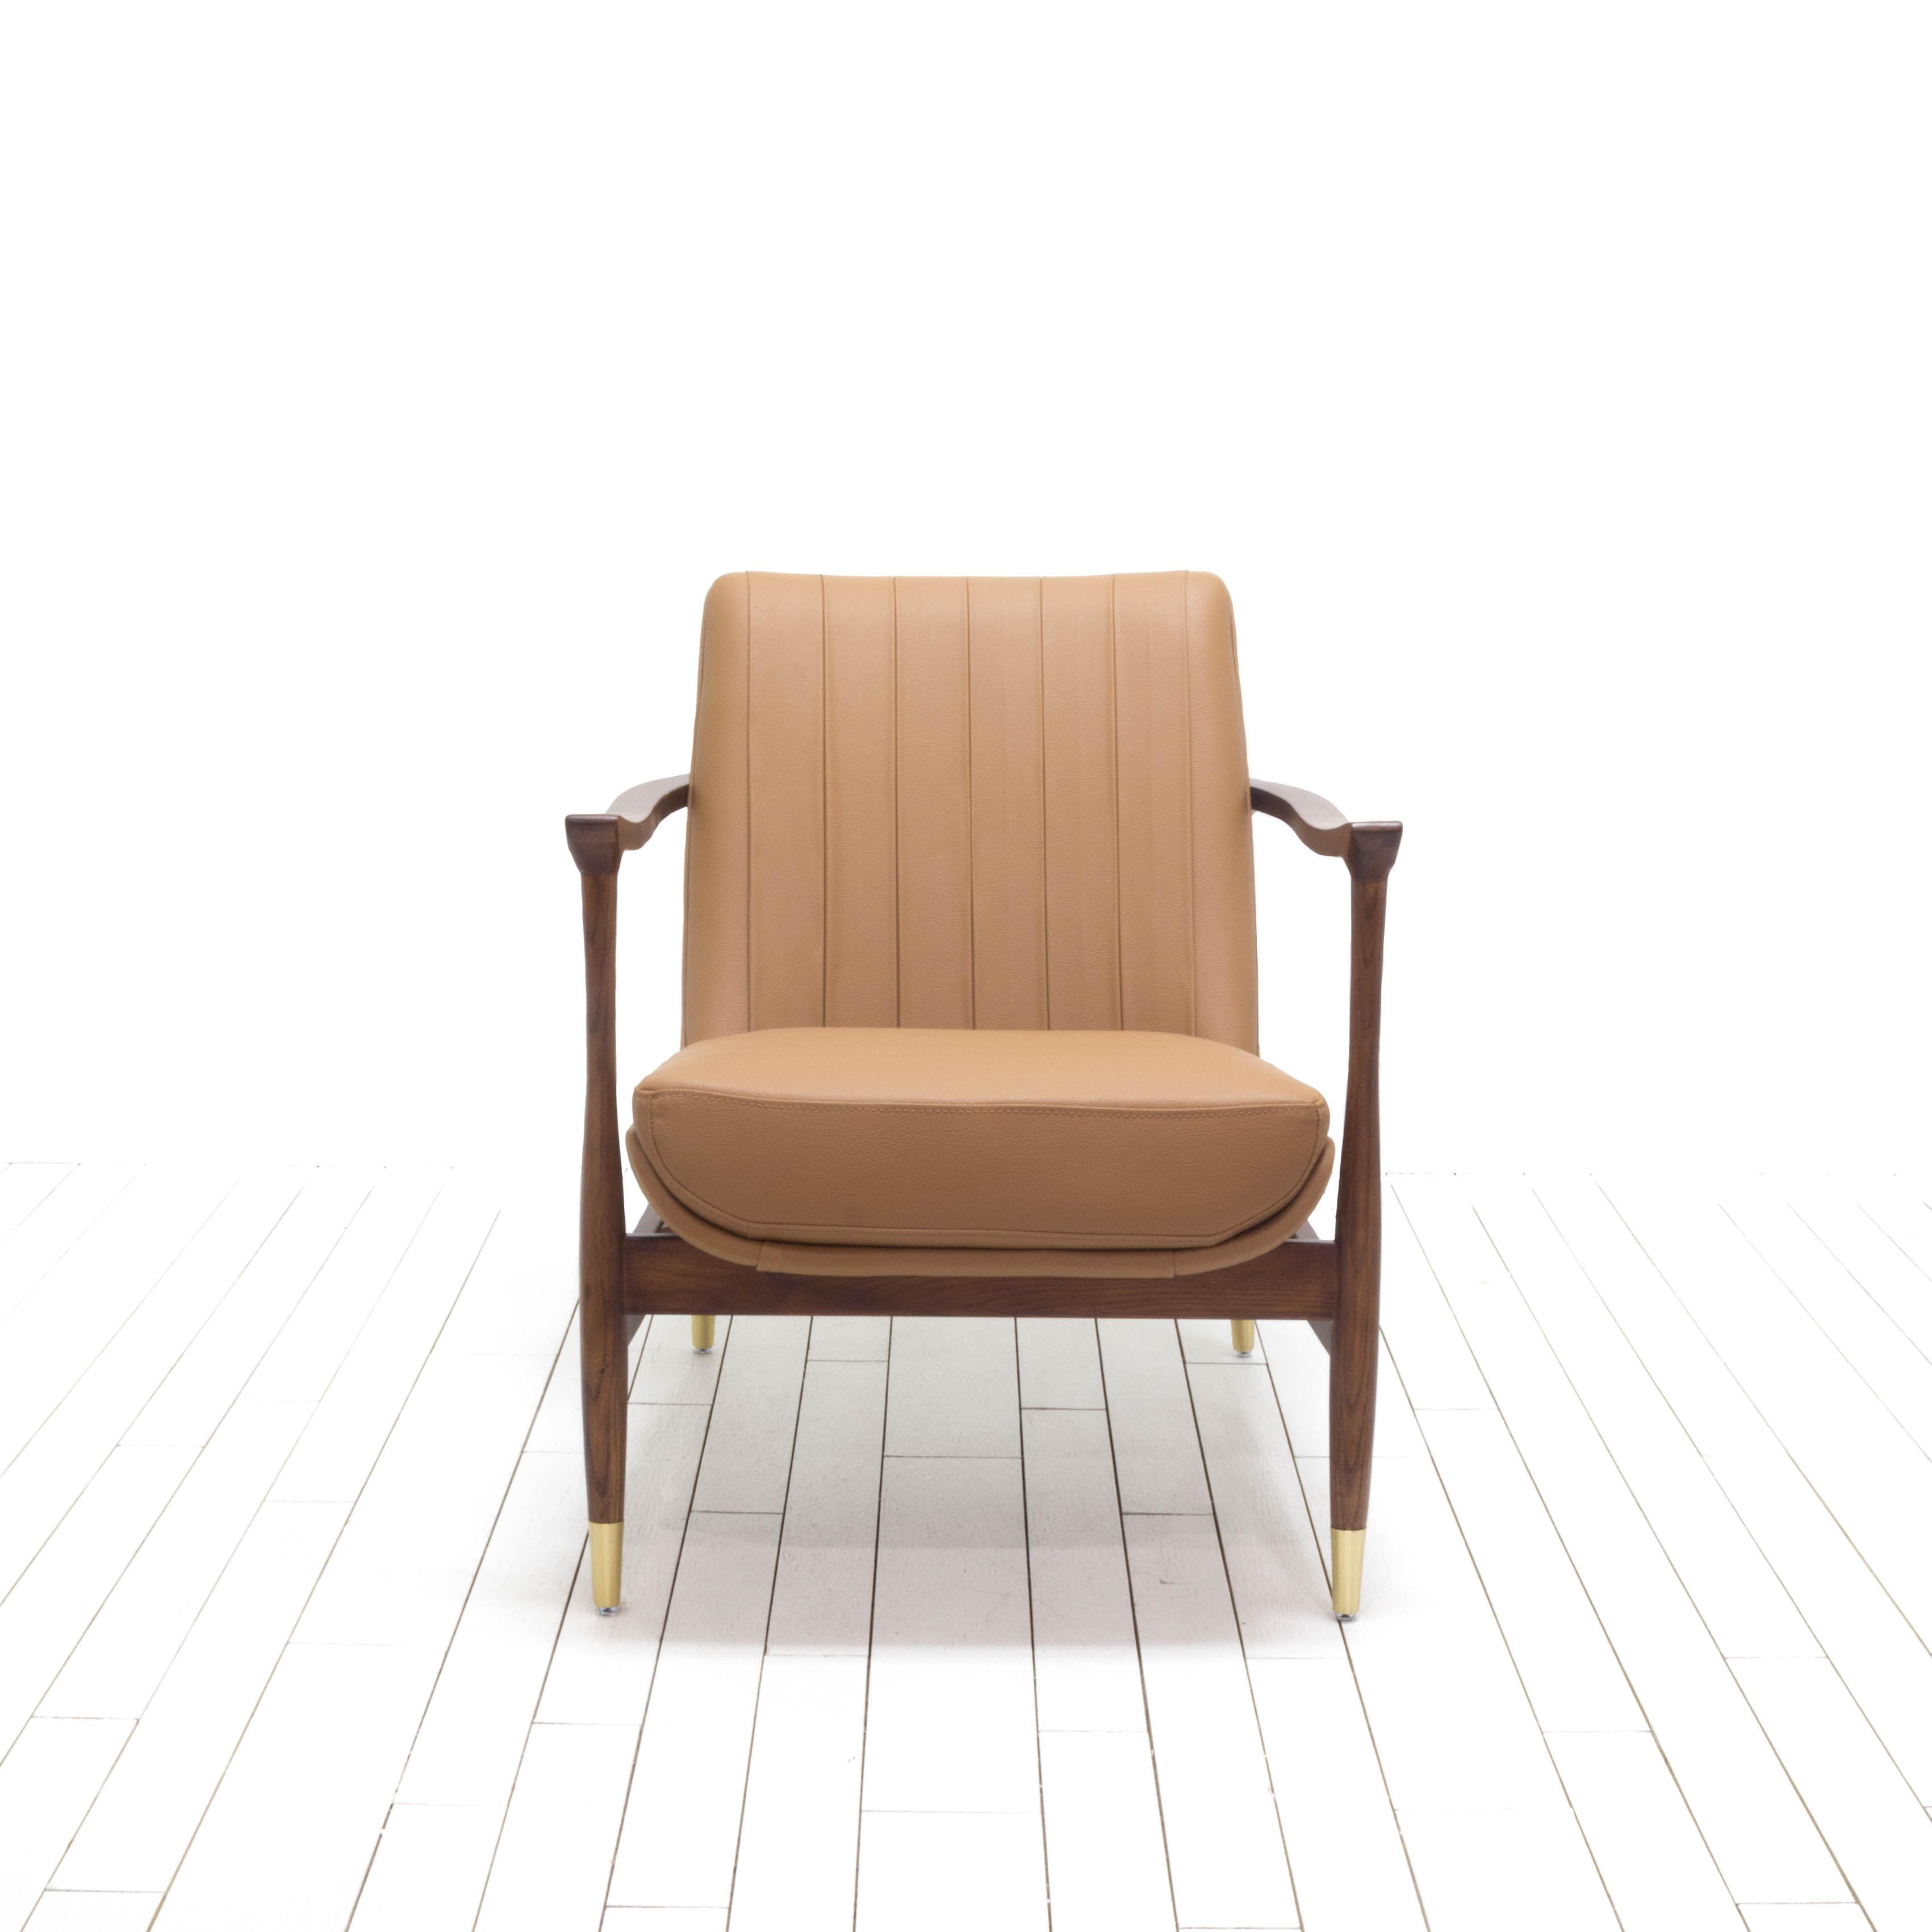 Davis Chairs - Camel